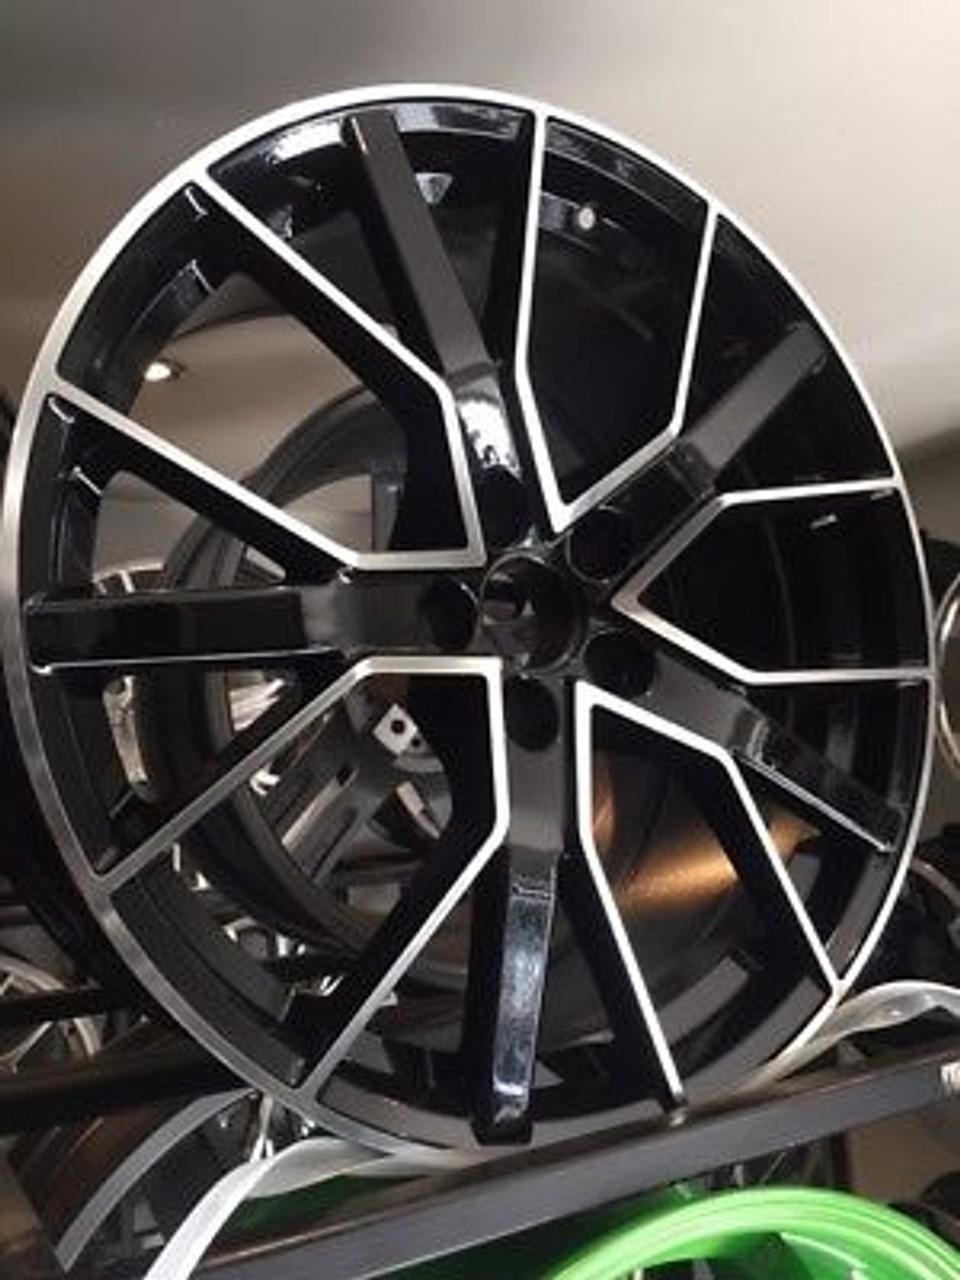 19 X 4 Rs6 D Black Pol Alloy Wheels Audi A5 A6 S5 A7 Q5 Q3 Hotline Tyres